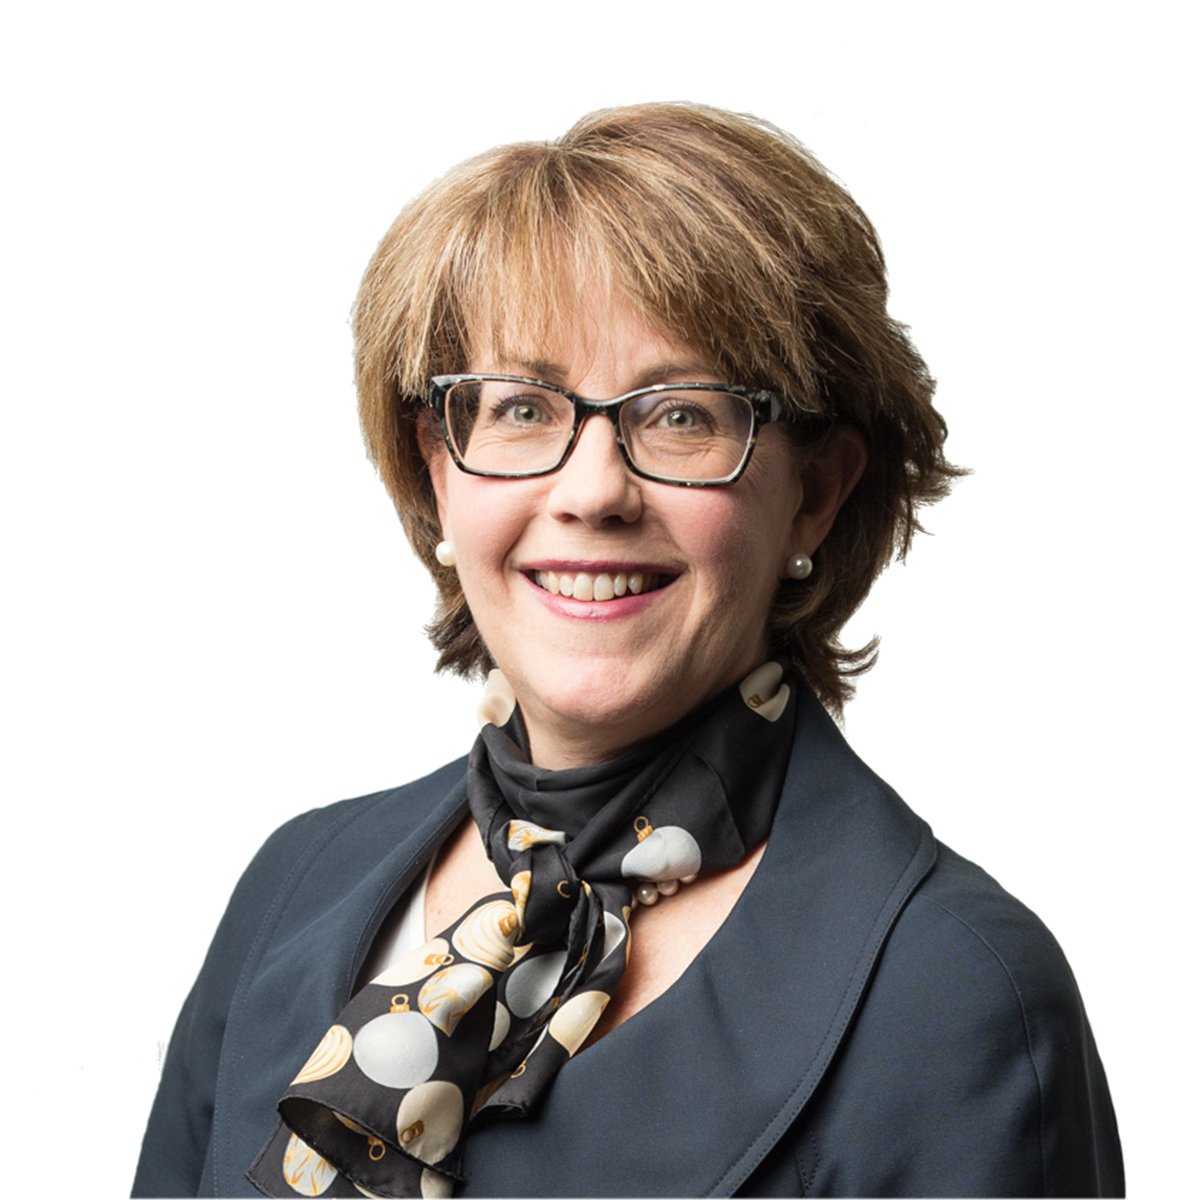 Julie Lundberg